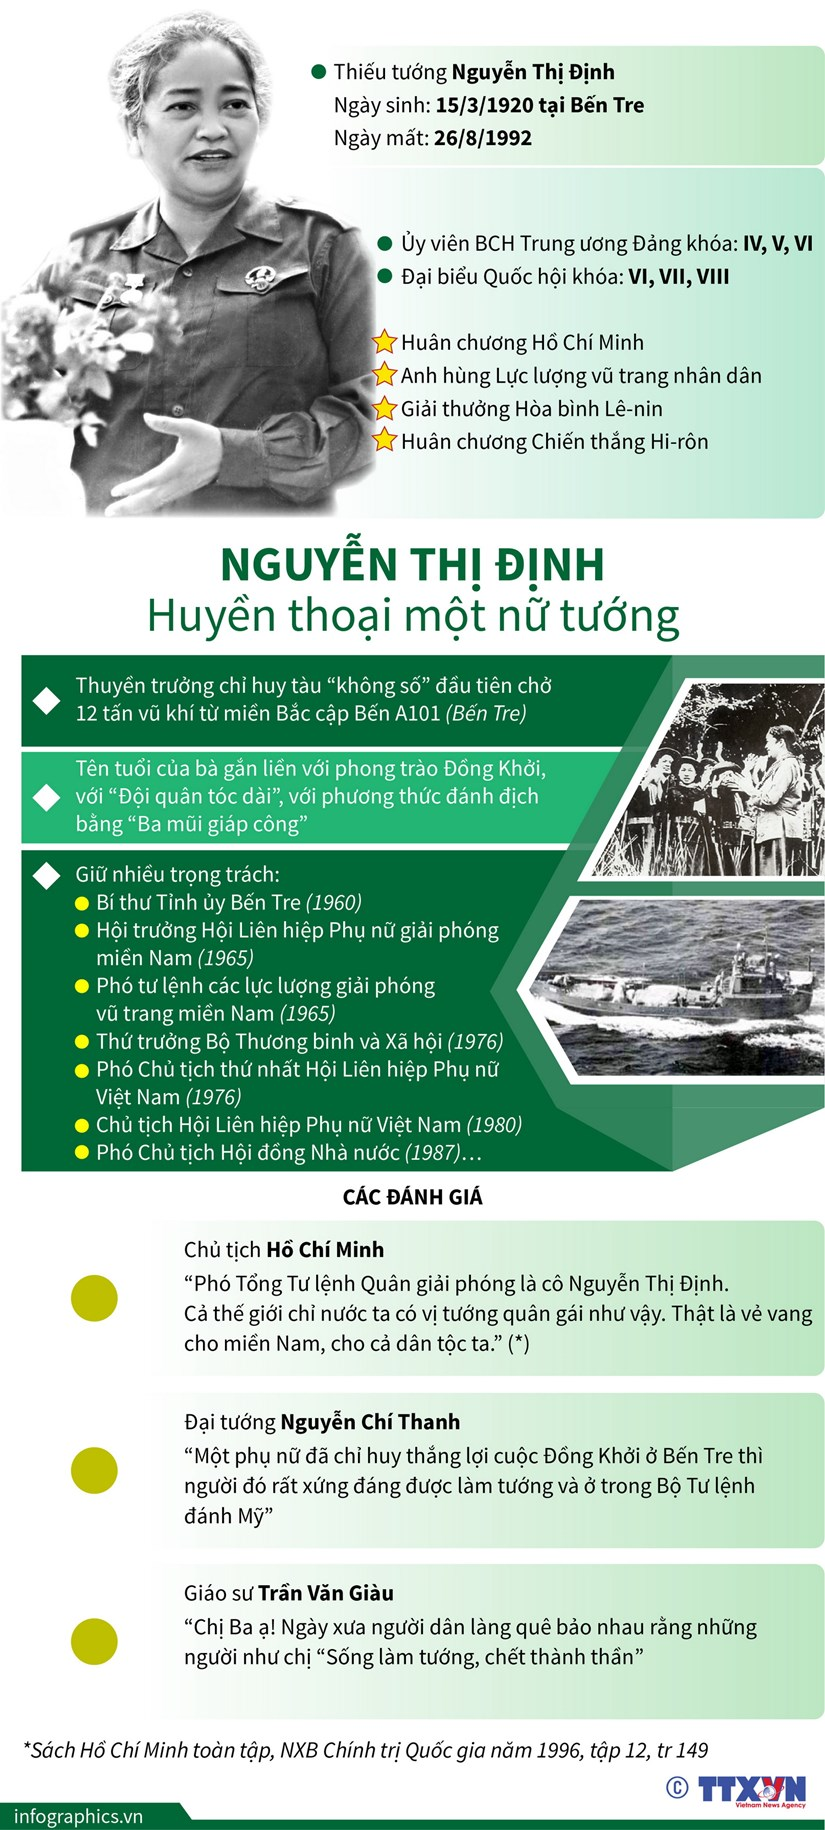 [Infographics] Nguyen Thi Dinh - Huyen thoai mot nu tuong hinh anh 1